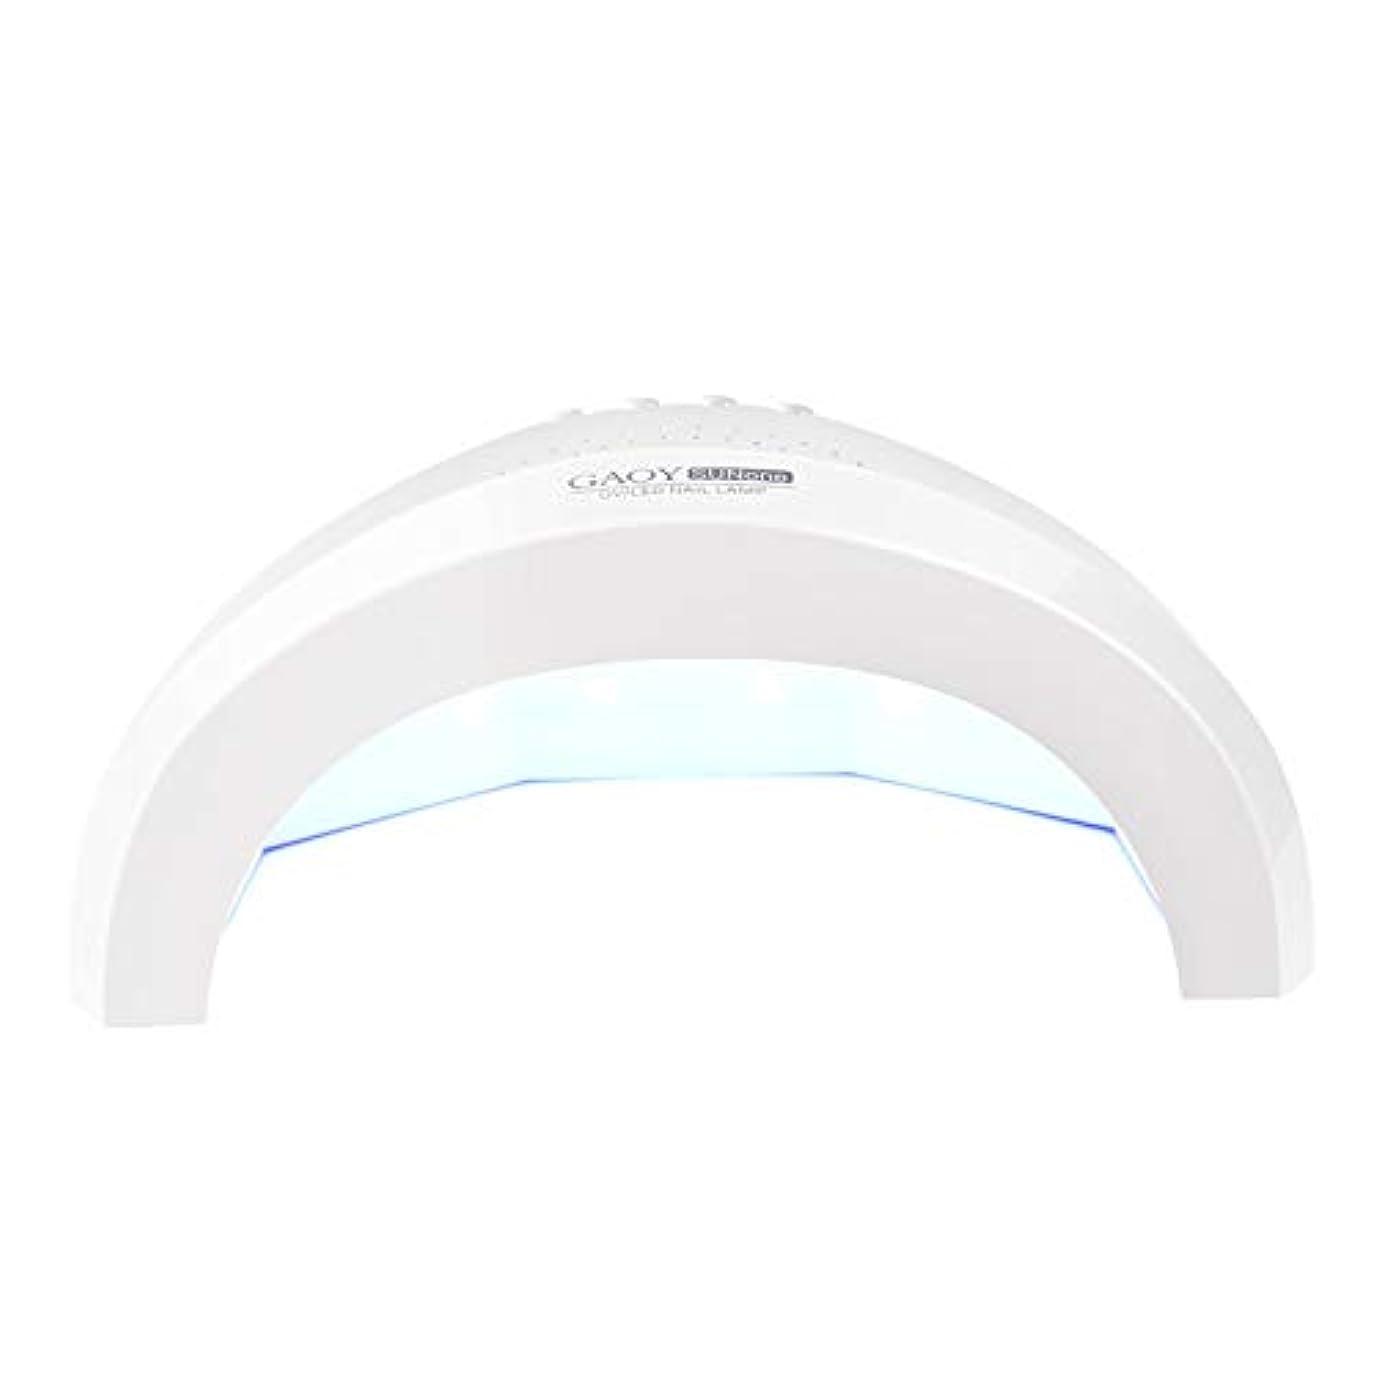 UVネイルジェルネイルライト/ 48Wネイルドライヤー光硬化ランプ付き30ビーズ/タイマー設定/センサー用LED UVジェルネイルポリッシュ